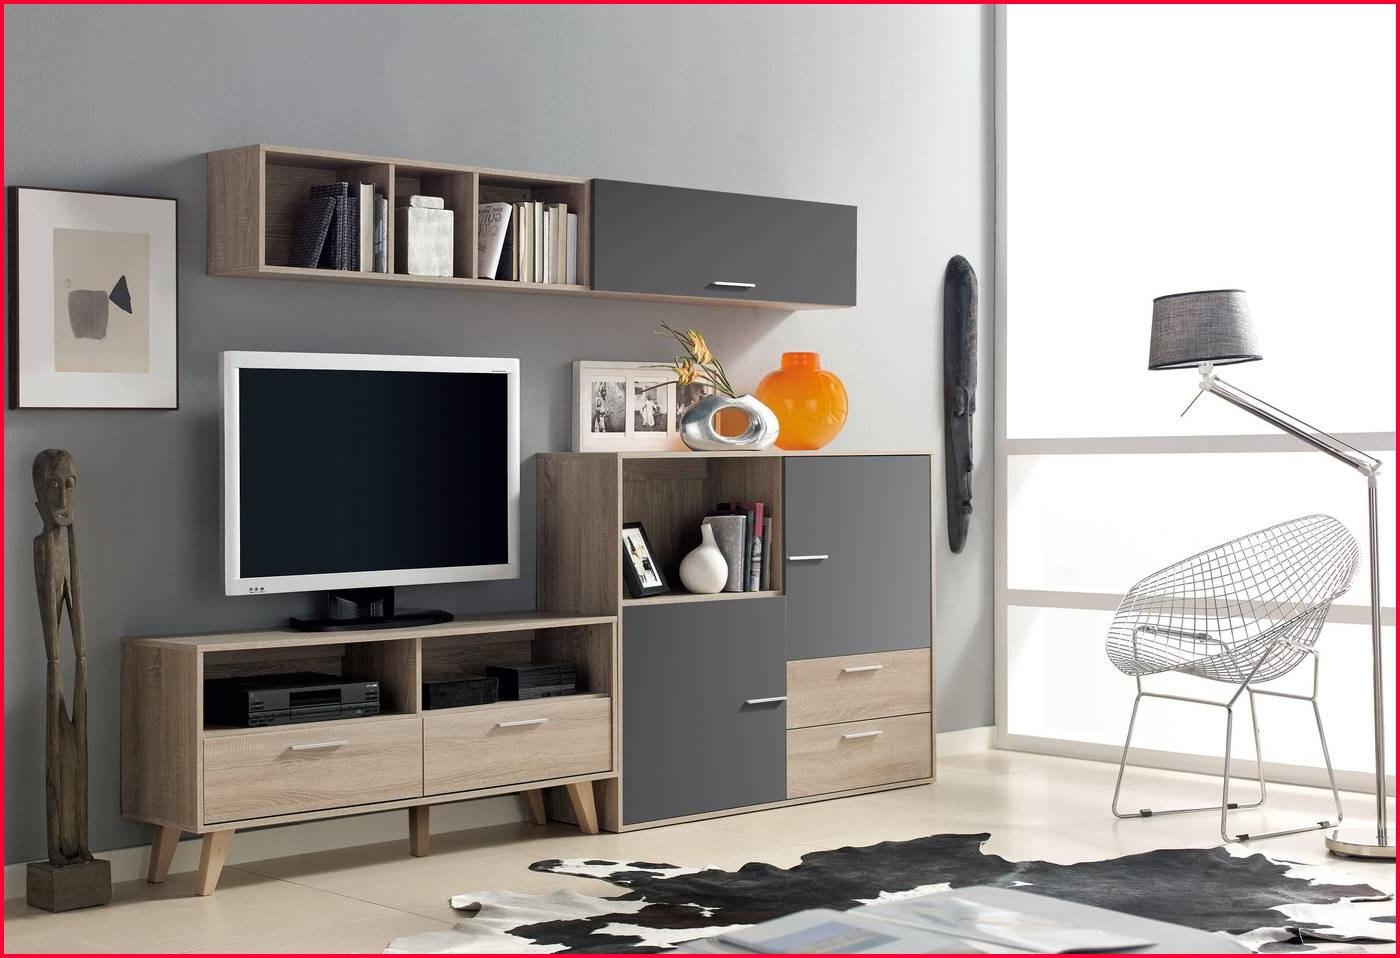 Muebles De Salon Ikea Ofertas Ipdd Ofertas Muebles Muebles De Salon Ikea Ofertas Mueble De